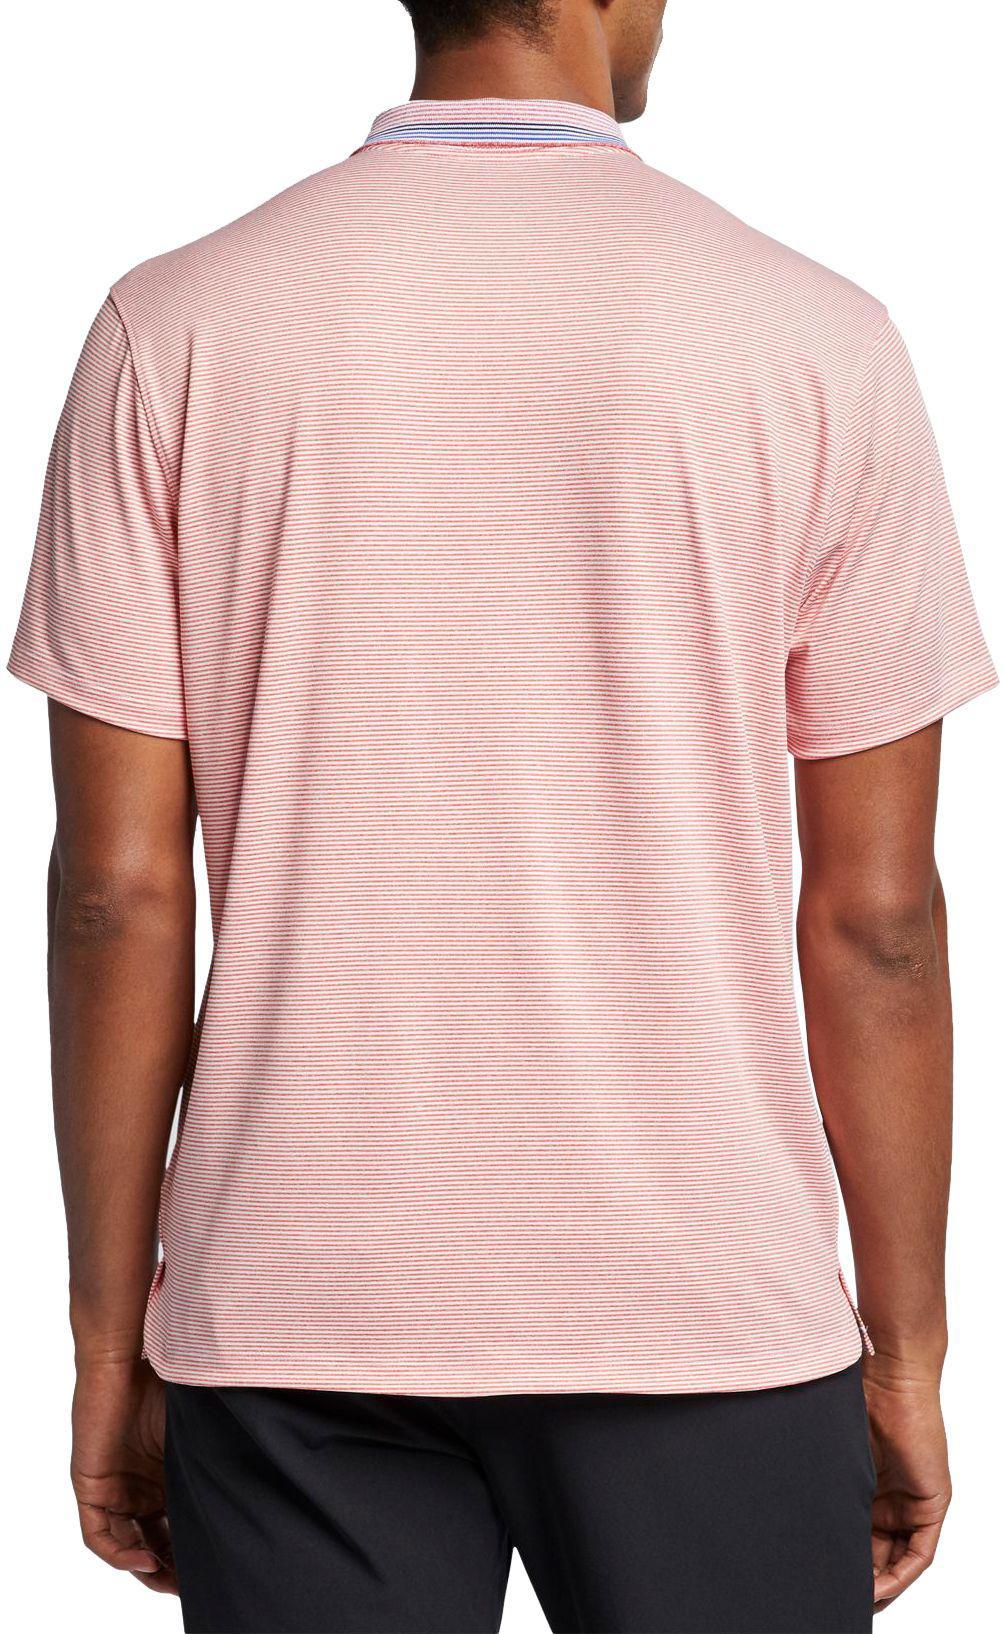 c377de1a2 Nike - Pink Vapor Control Stripe Golf Polo for Men - Lyst. View fullscreen